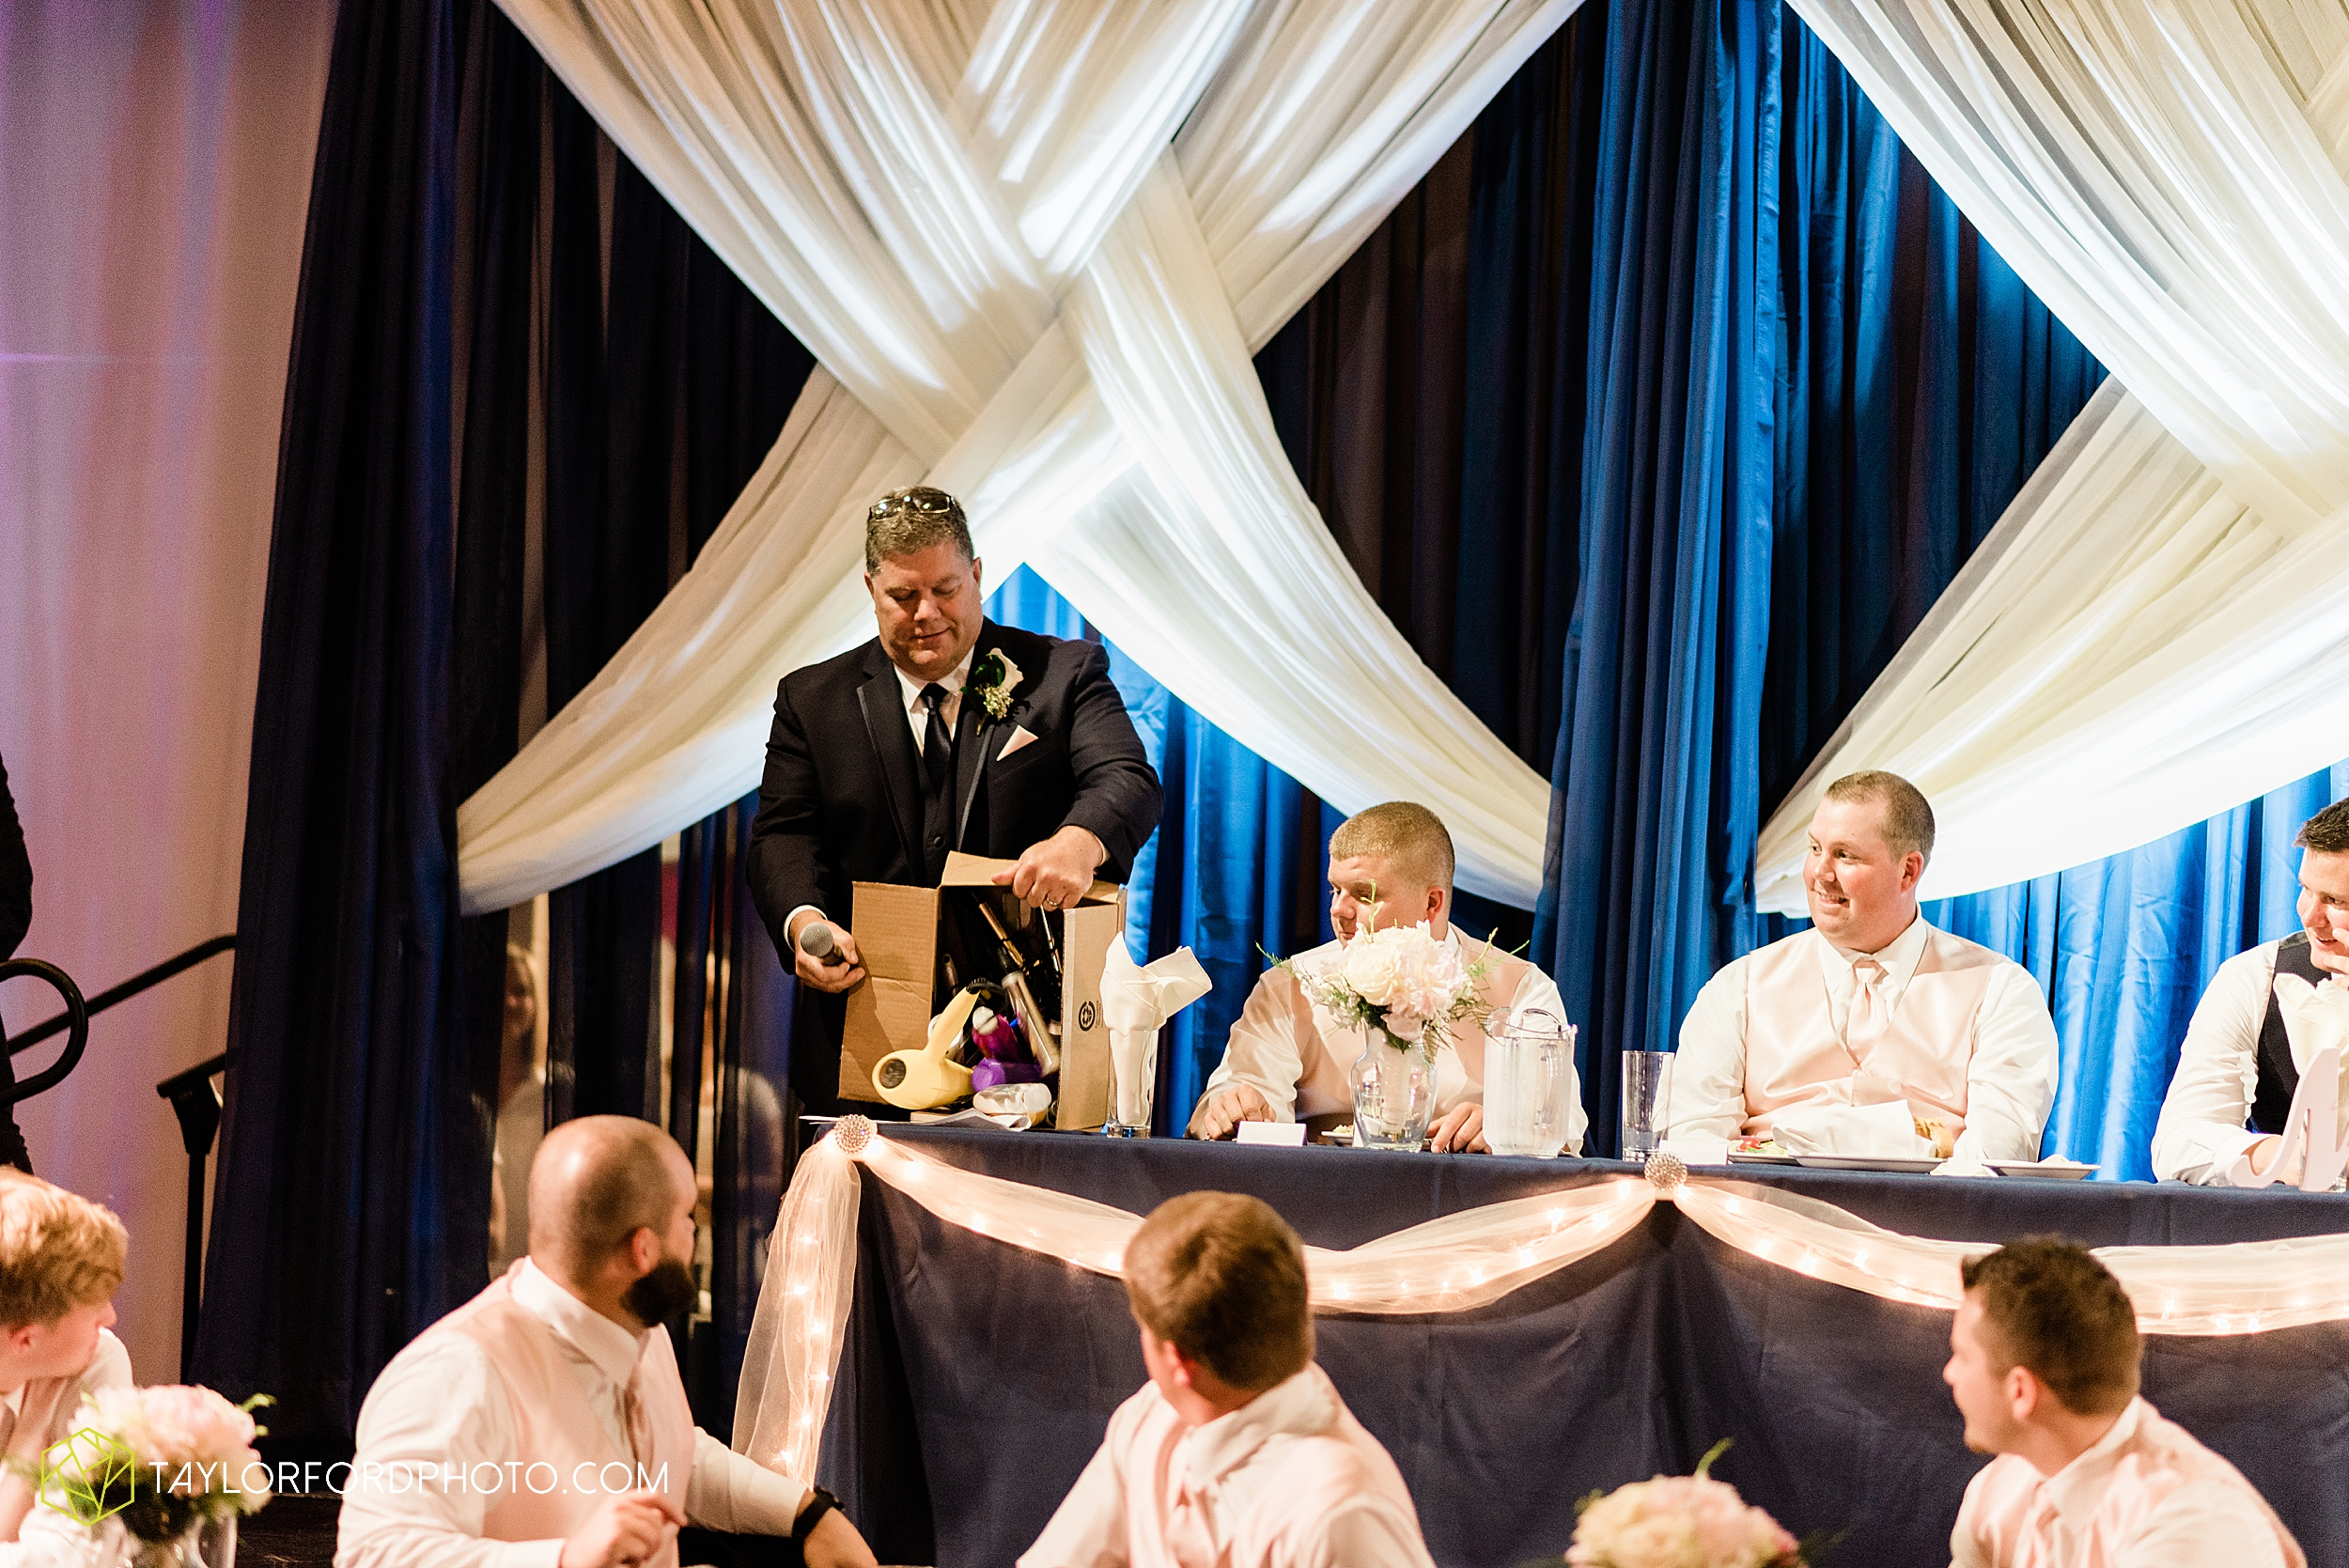 carly-trent-lima-elida-ohio-wedding-the-met-civic-center-reception-immanuel-united-methodist-church-photography-taylor-ford-hirschy-photographer_3373.jpg